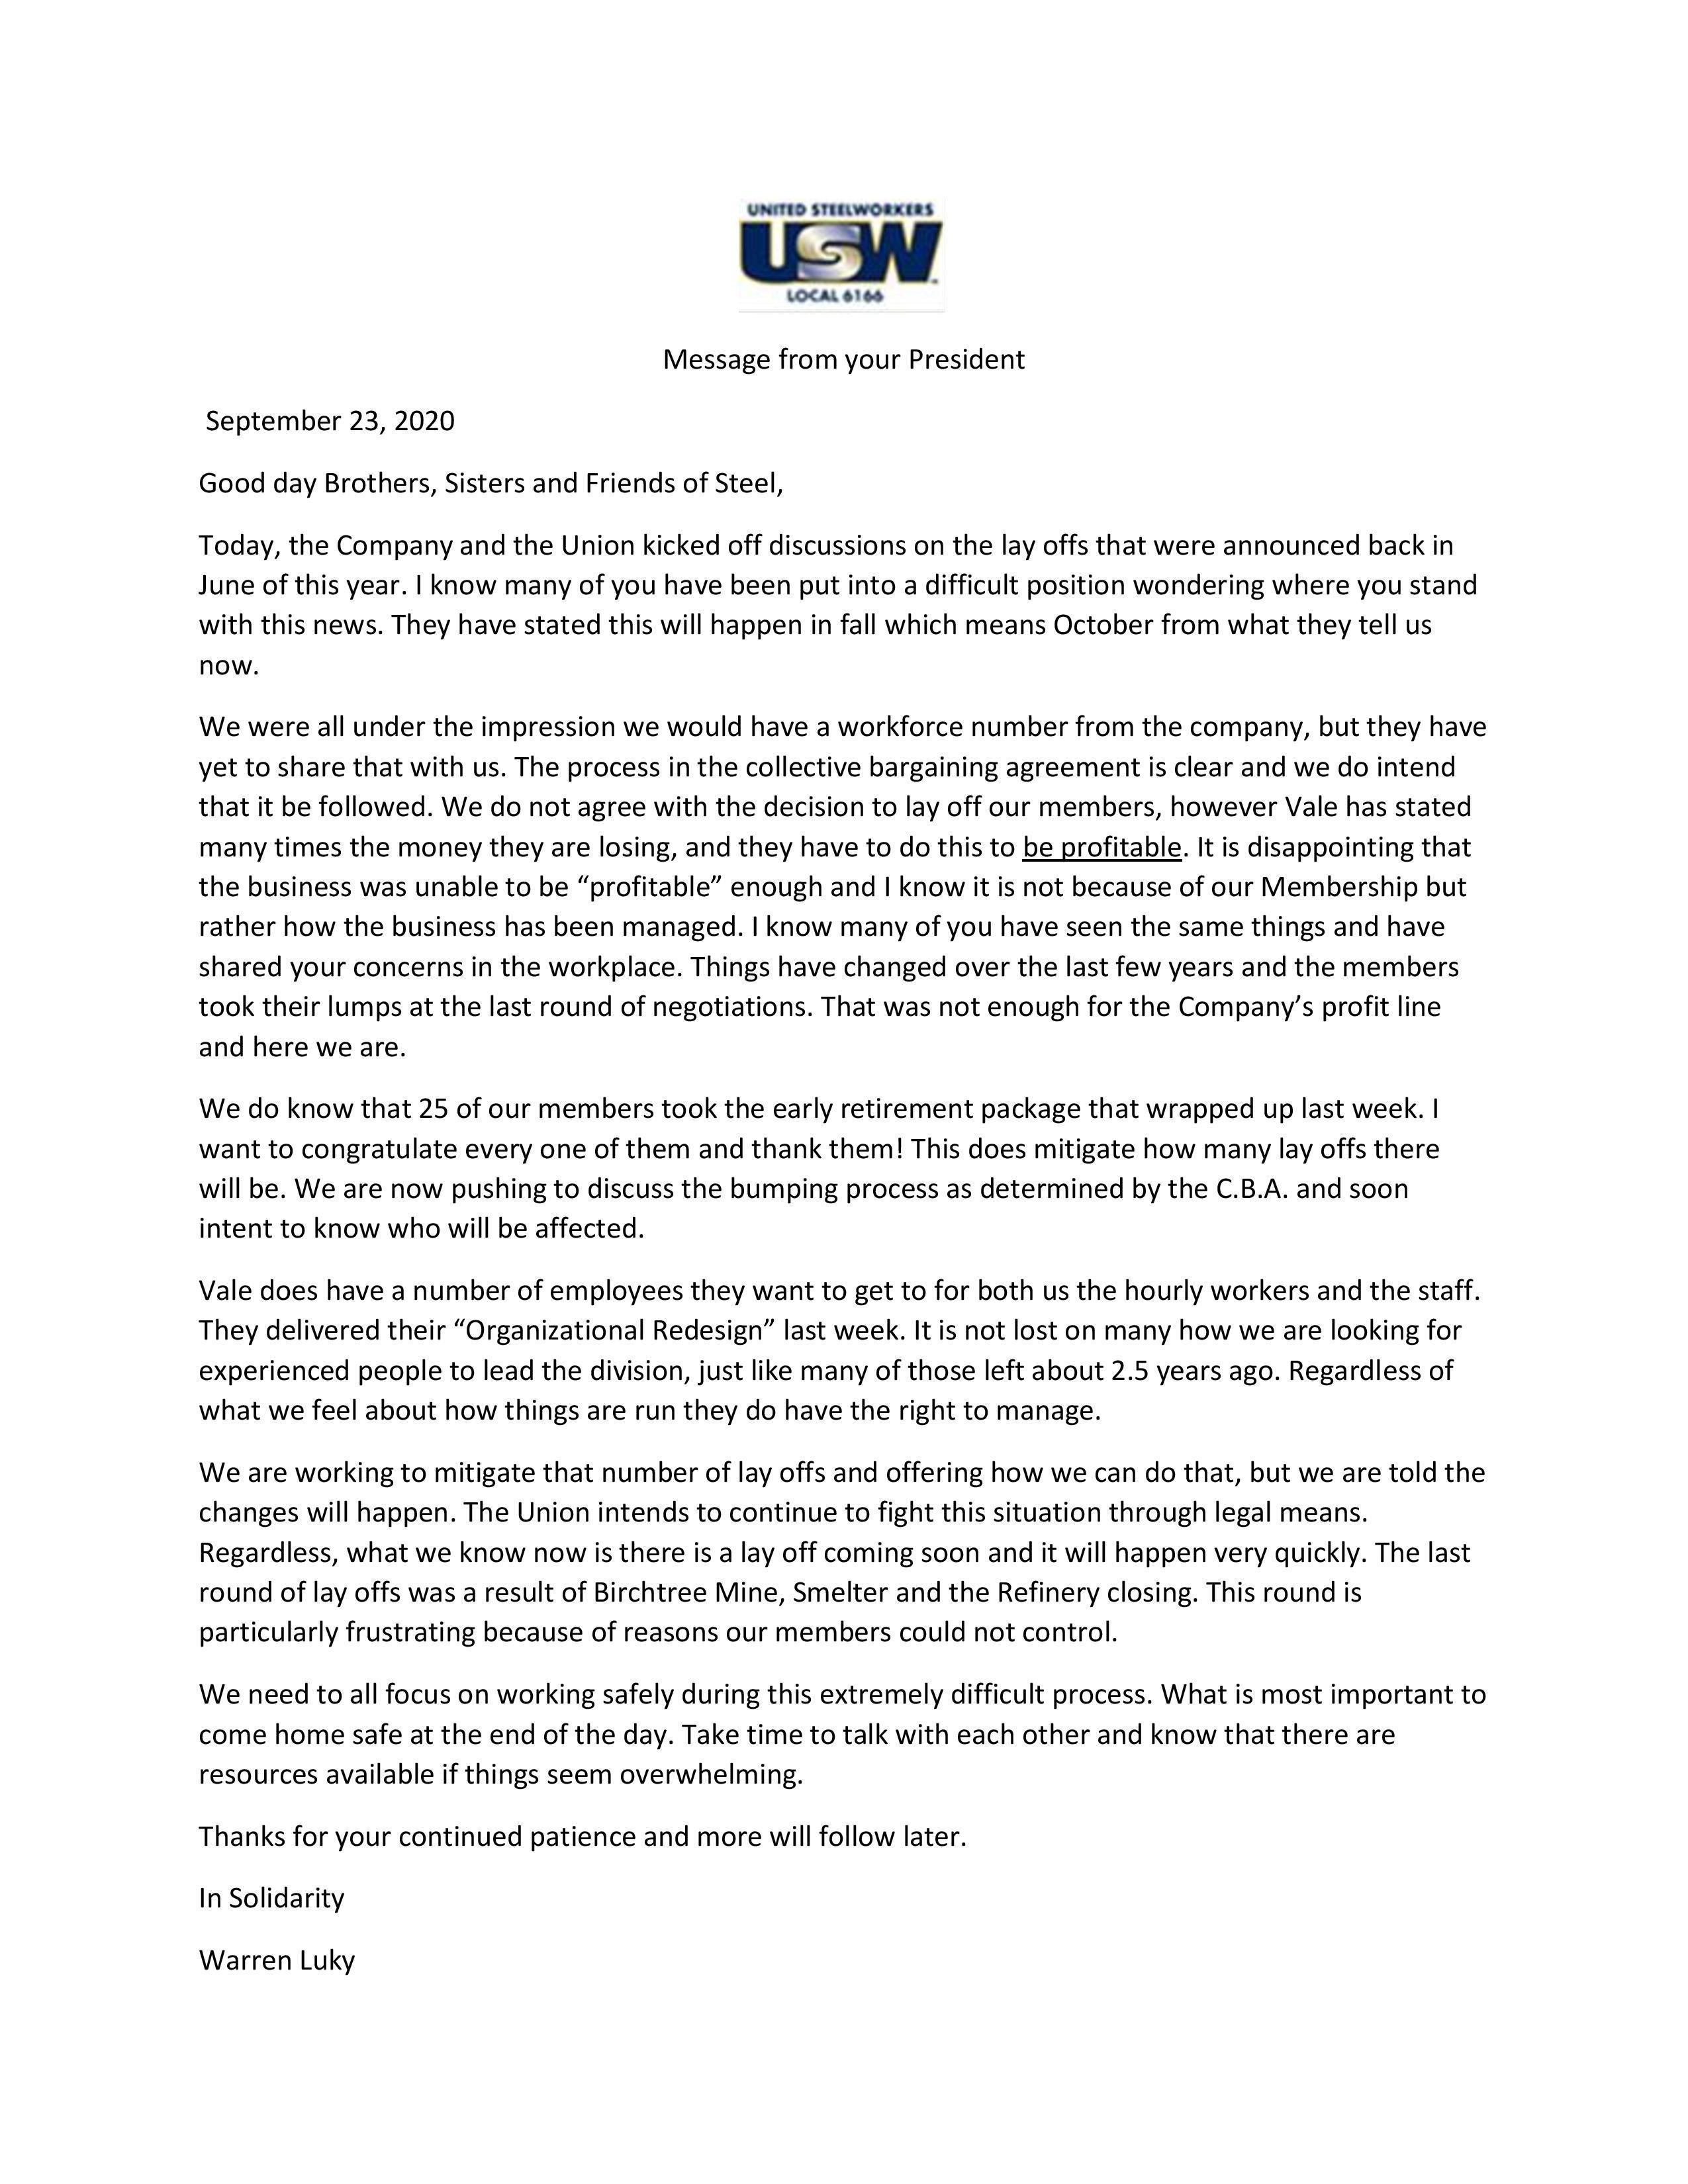 President message